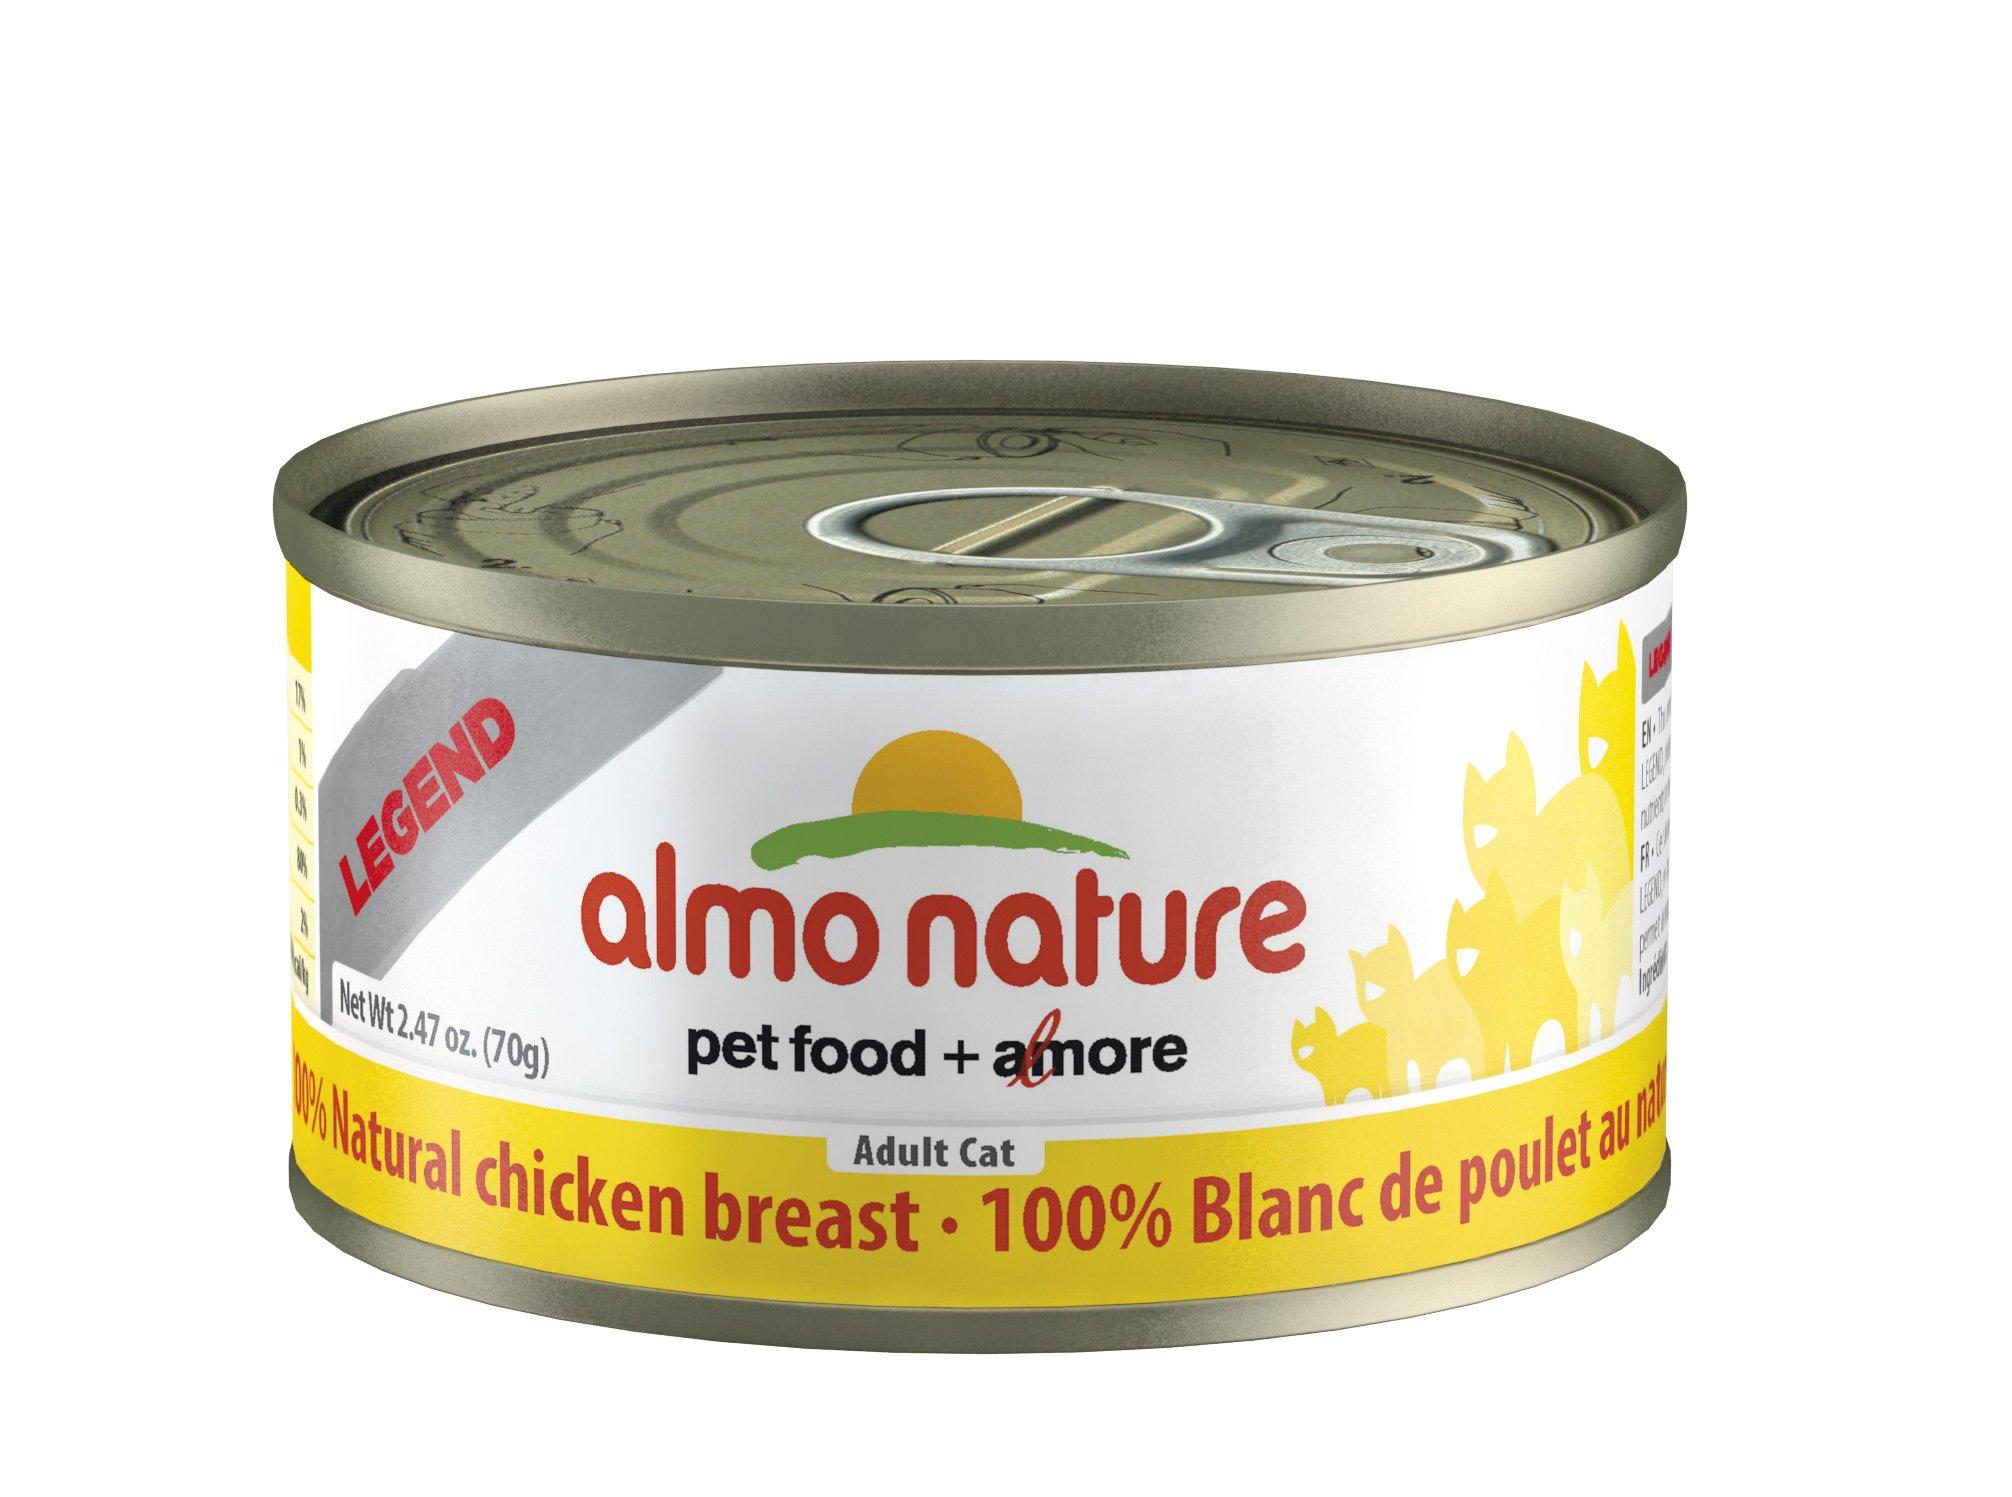 Almo Nature Chicken Breast Food (24 Cans Per Case), 2.47 oz.